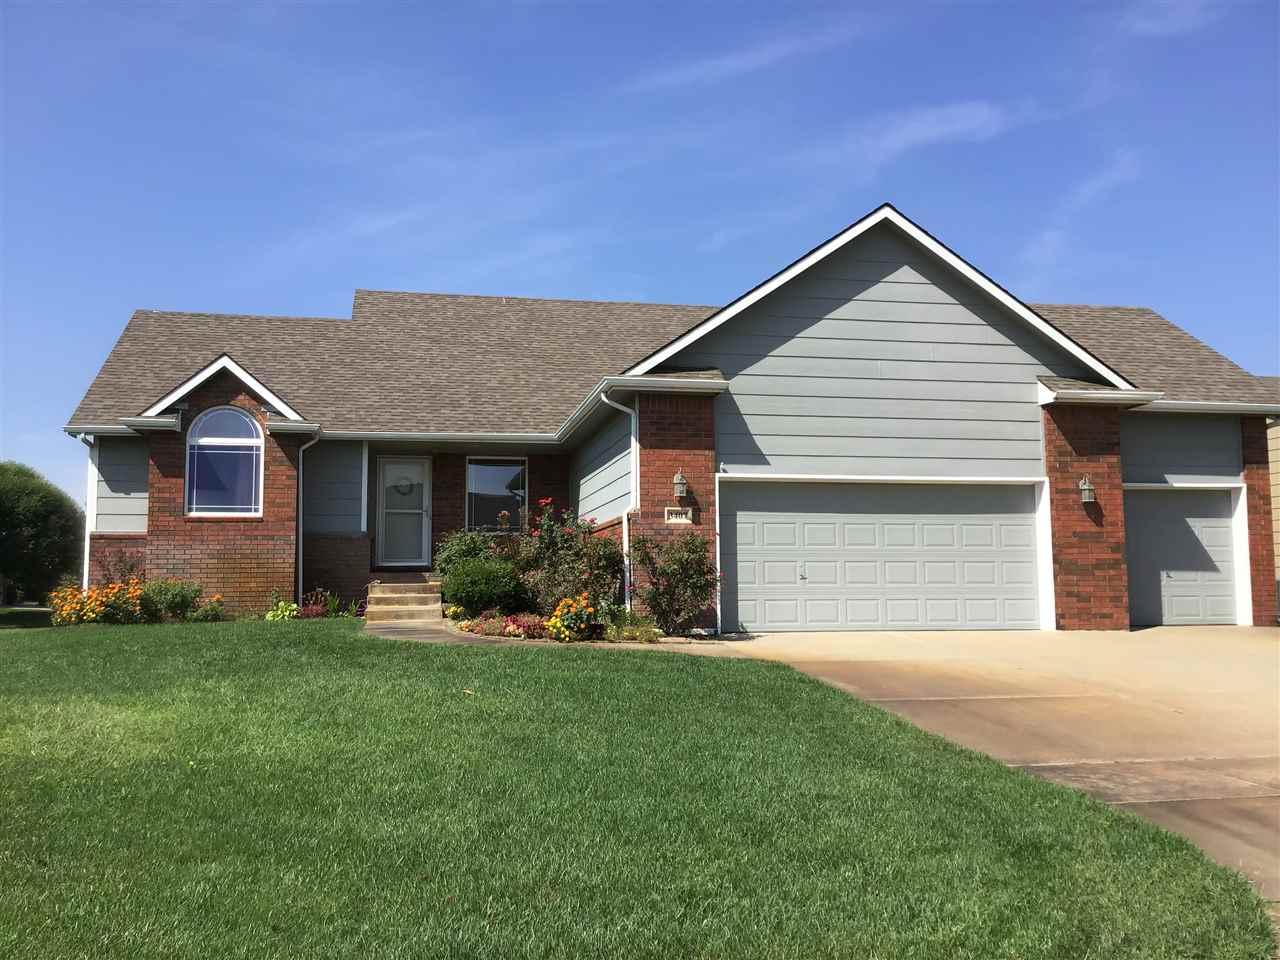 3407 N Ridge Port St, Wichita, KS, 67205